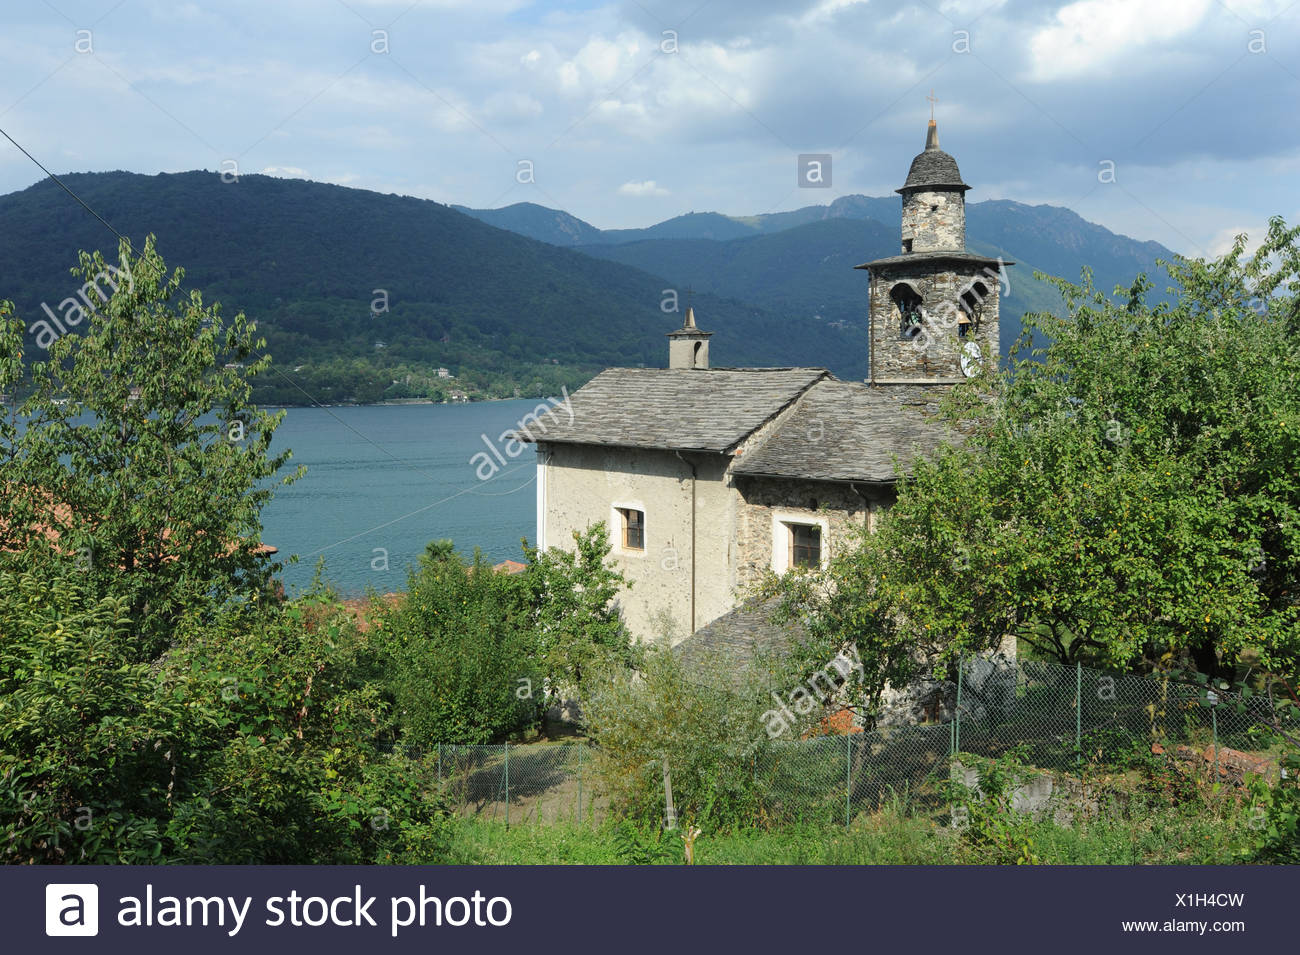 Italy, Piemont, Orta, Ronco, lake, Kirch, scenery - Stock Image